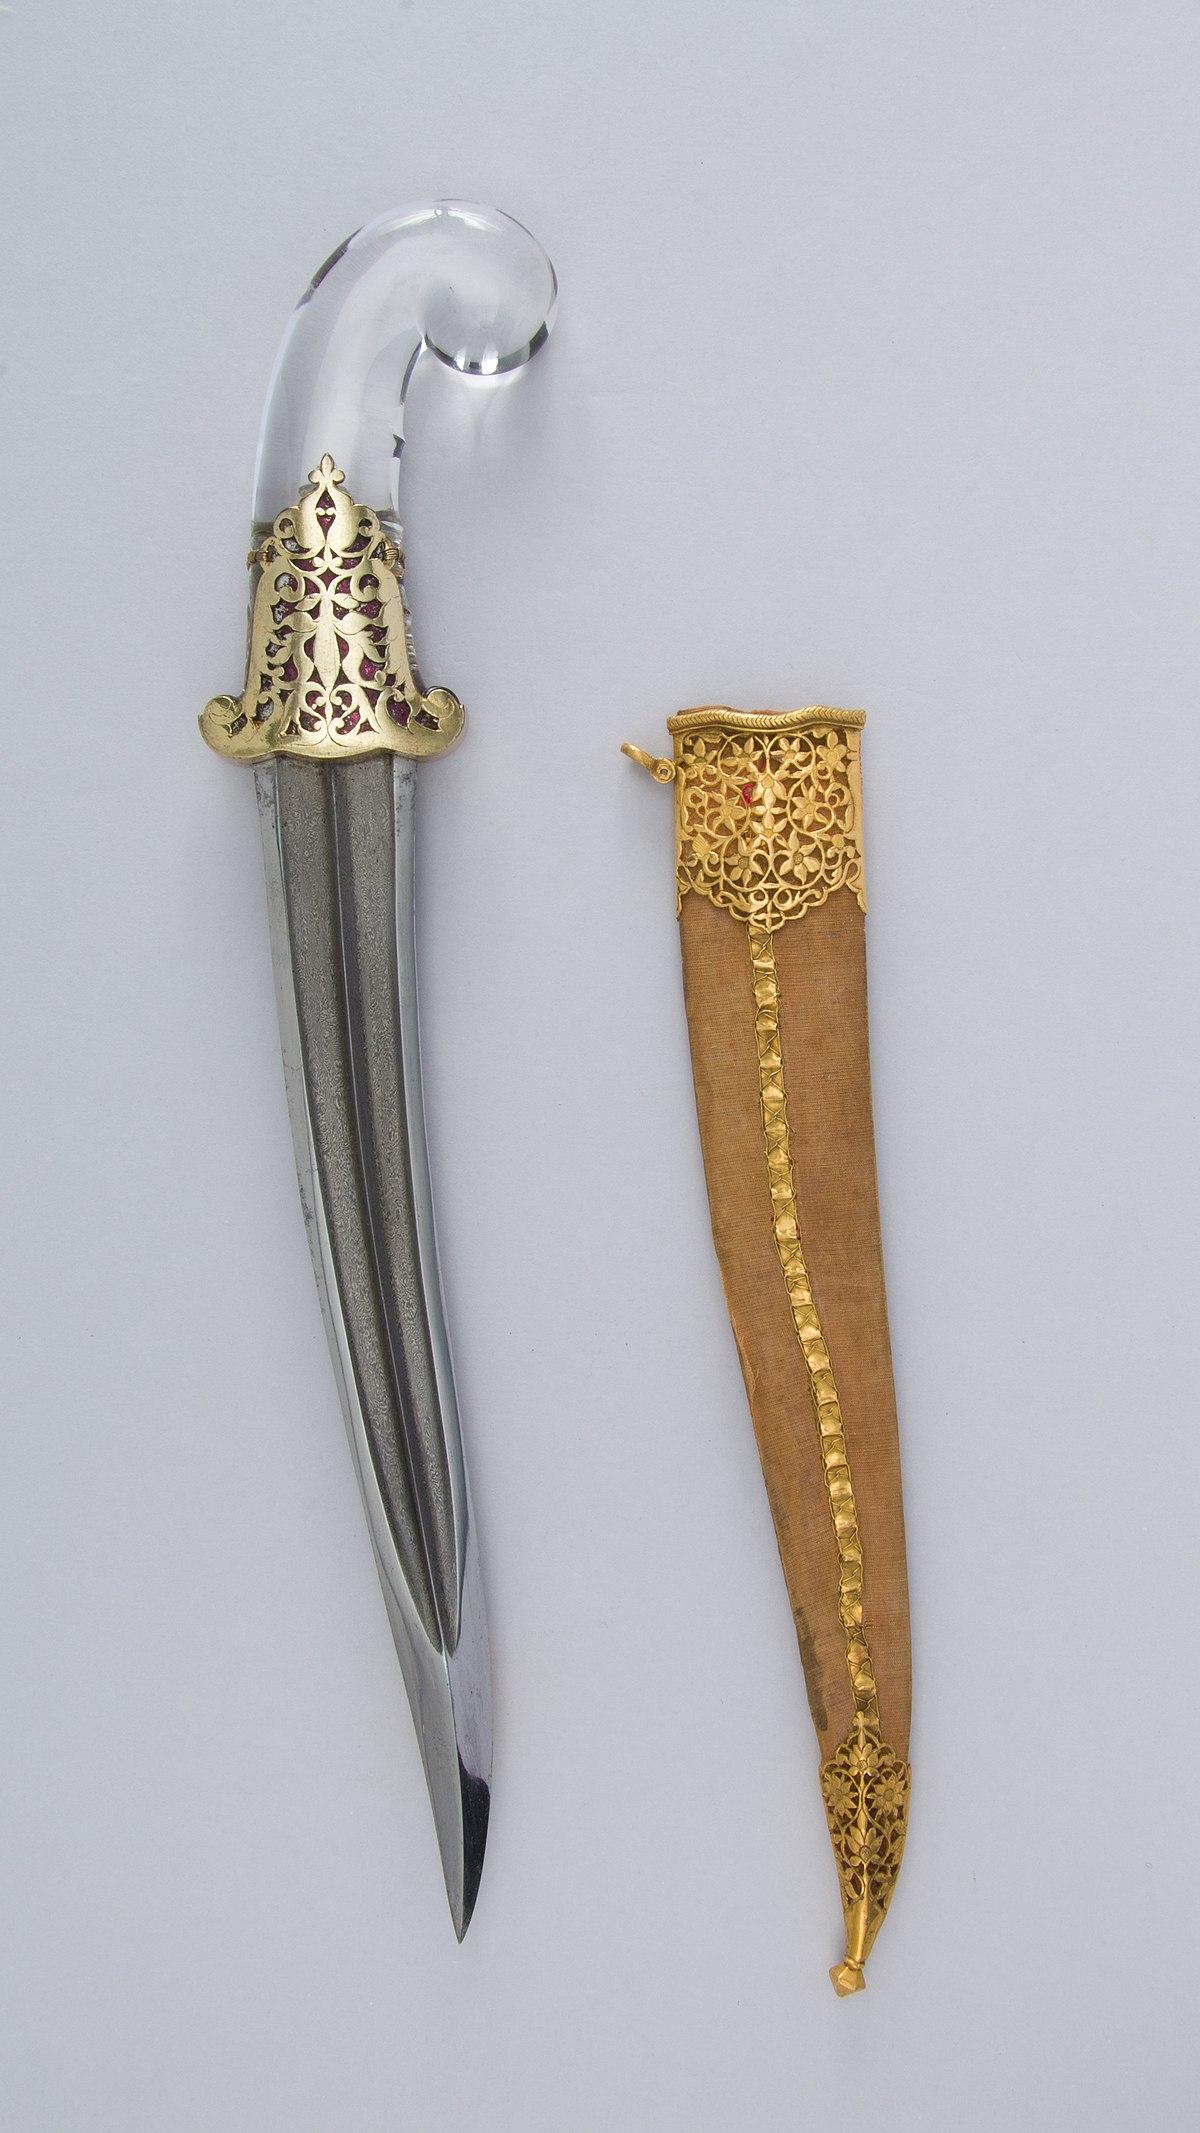 Dagger (Khanjar) with Sheath MET 36.25.718ab 005june2014.jpg